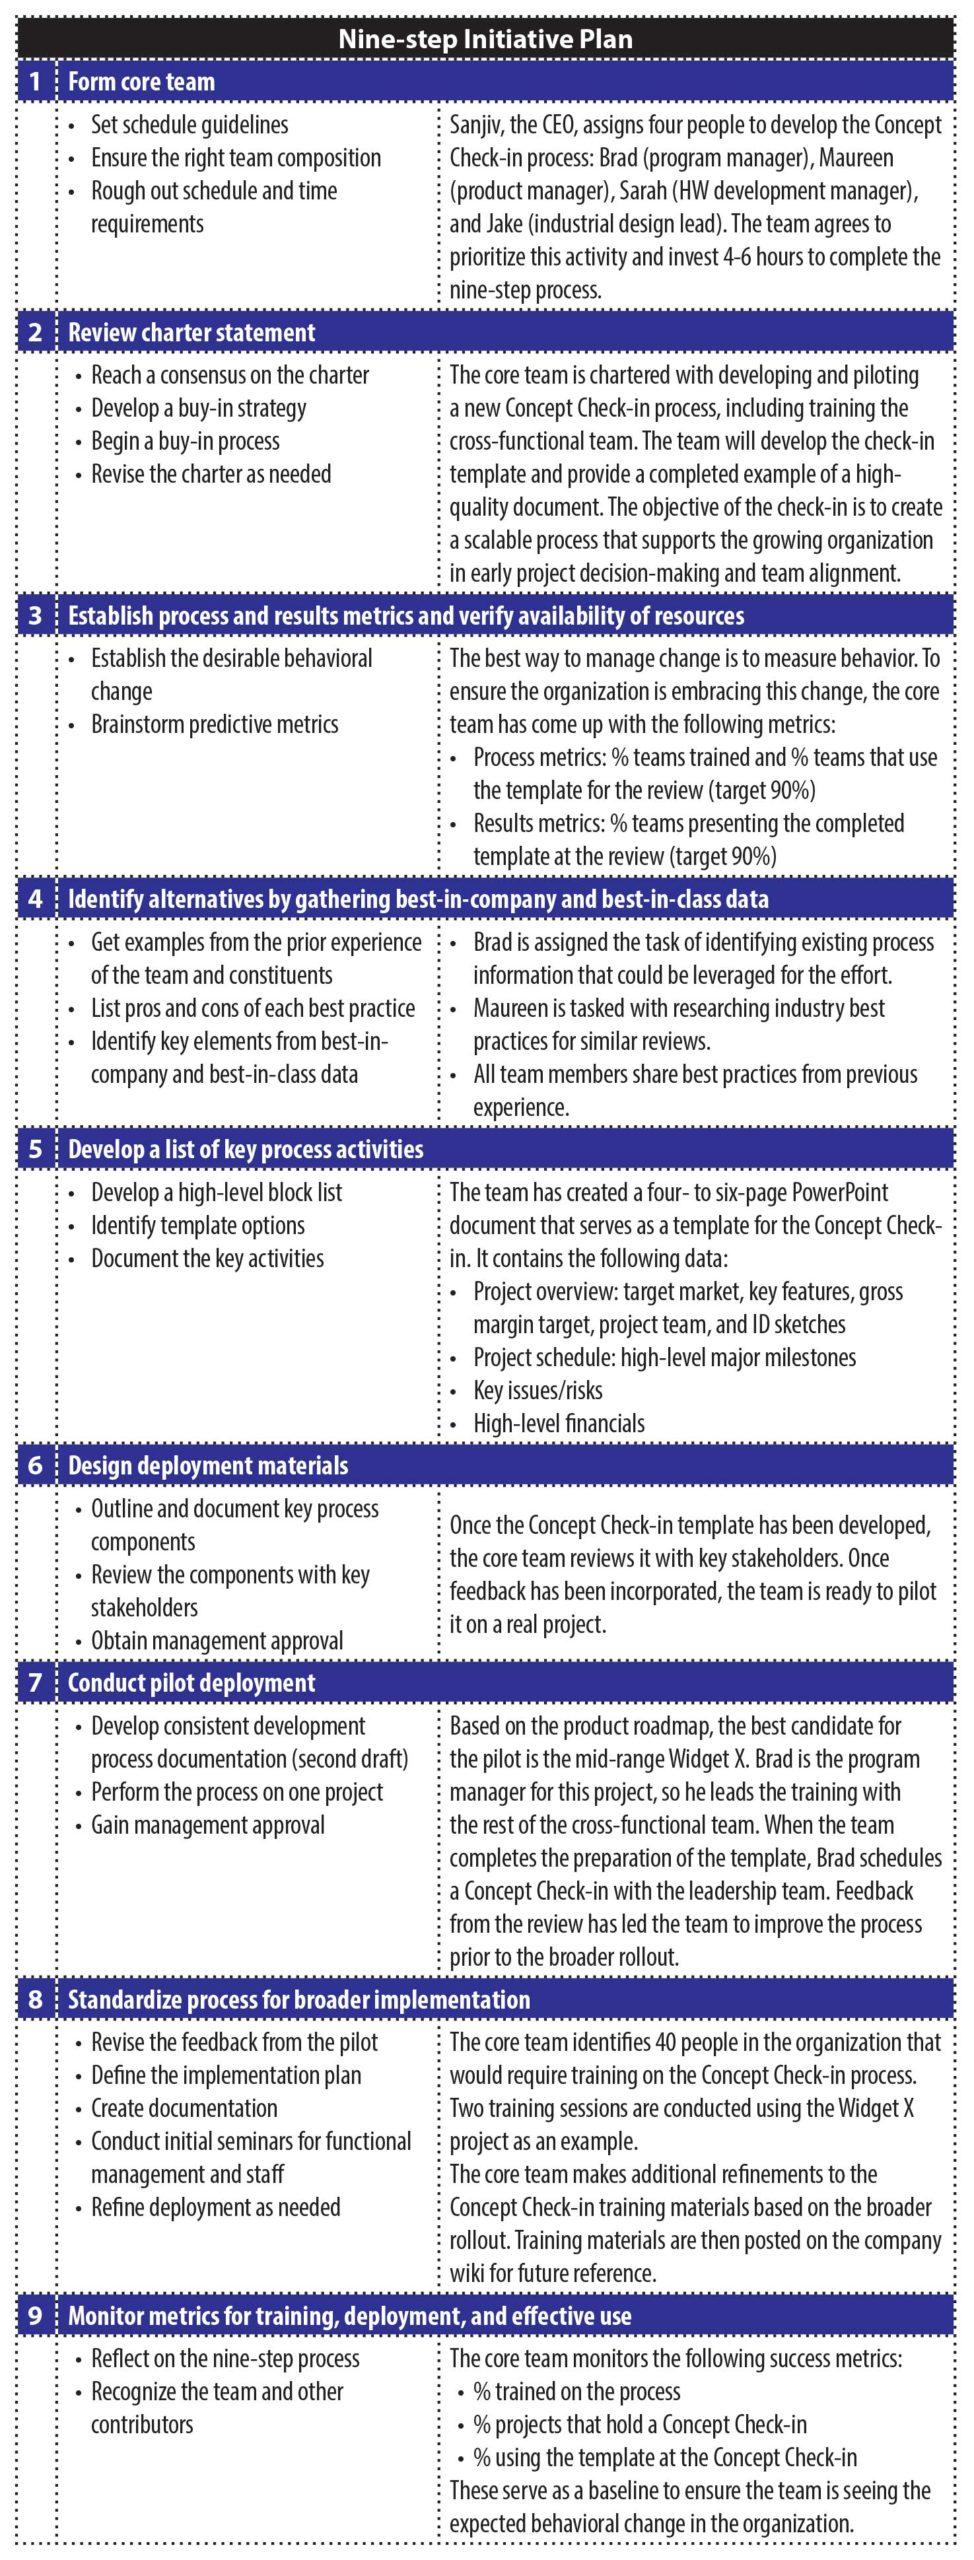 Nine-step Initiative Plan